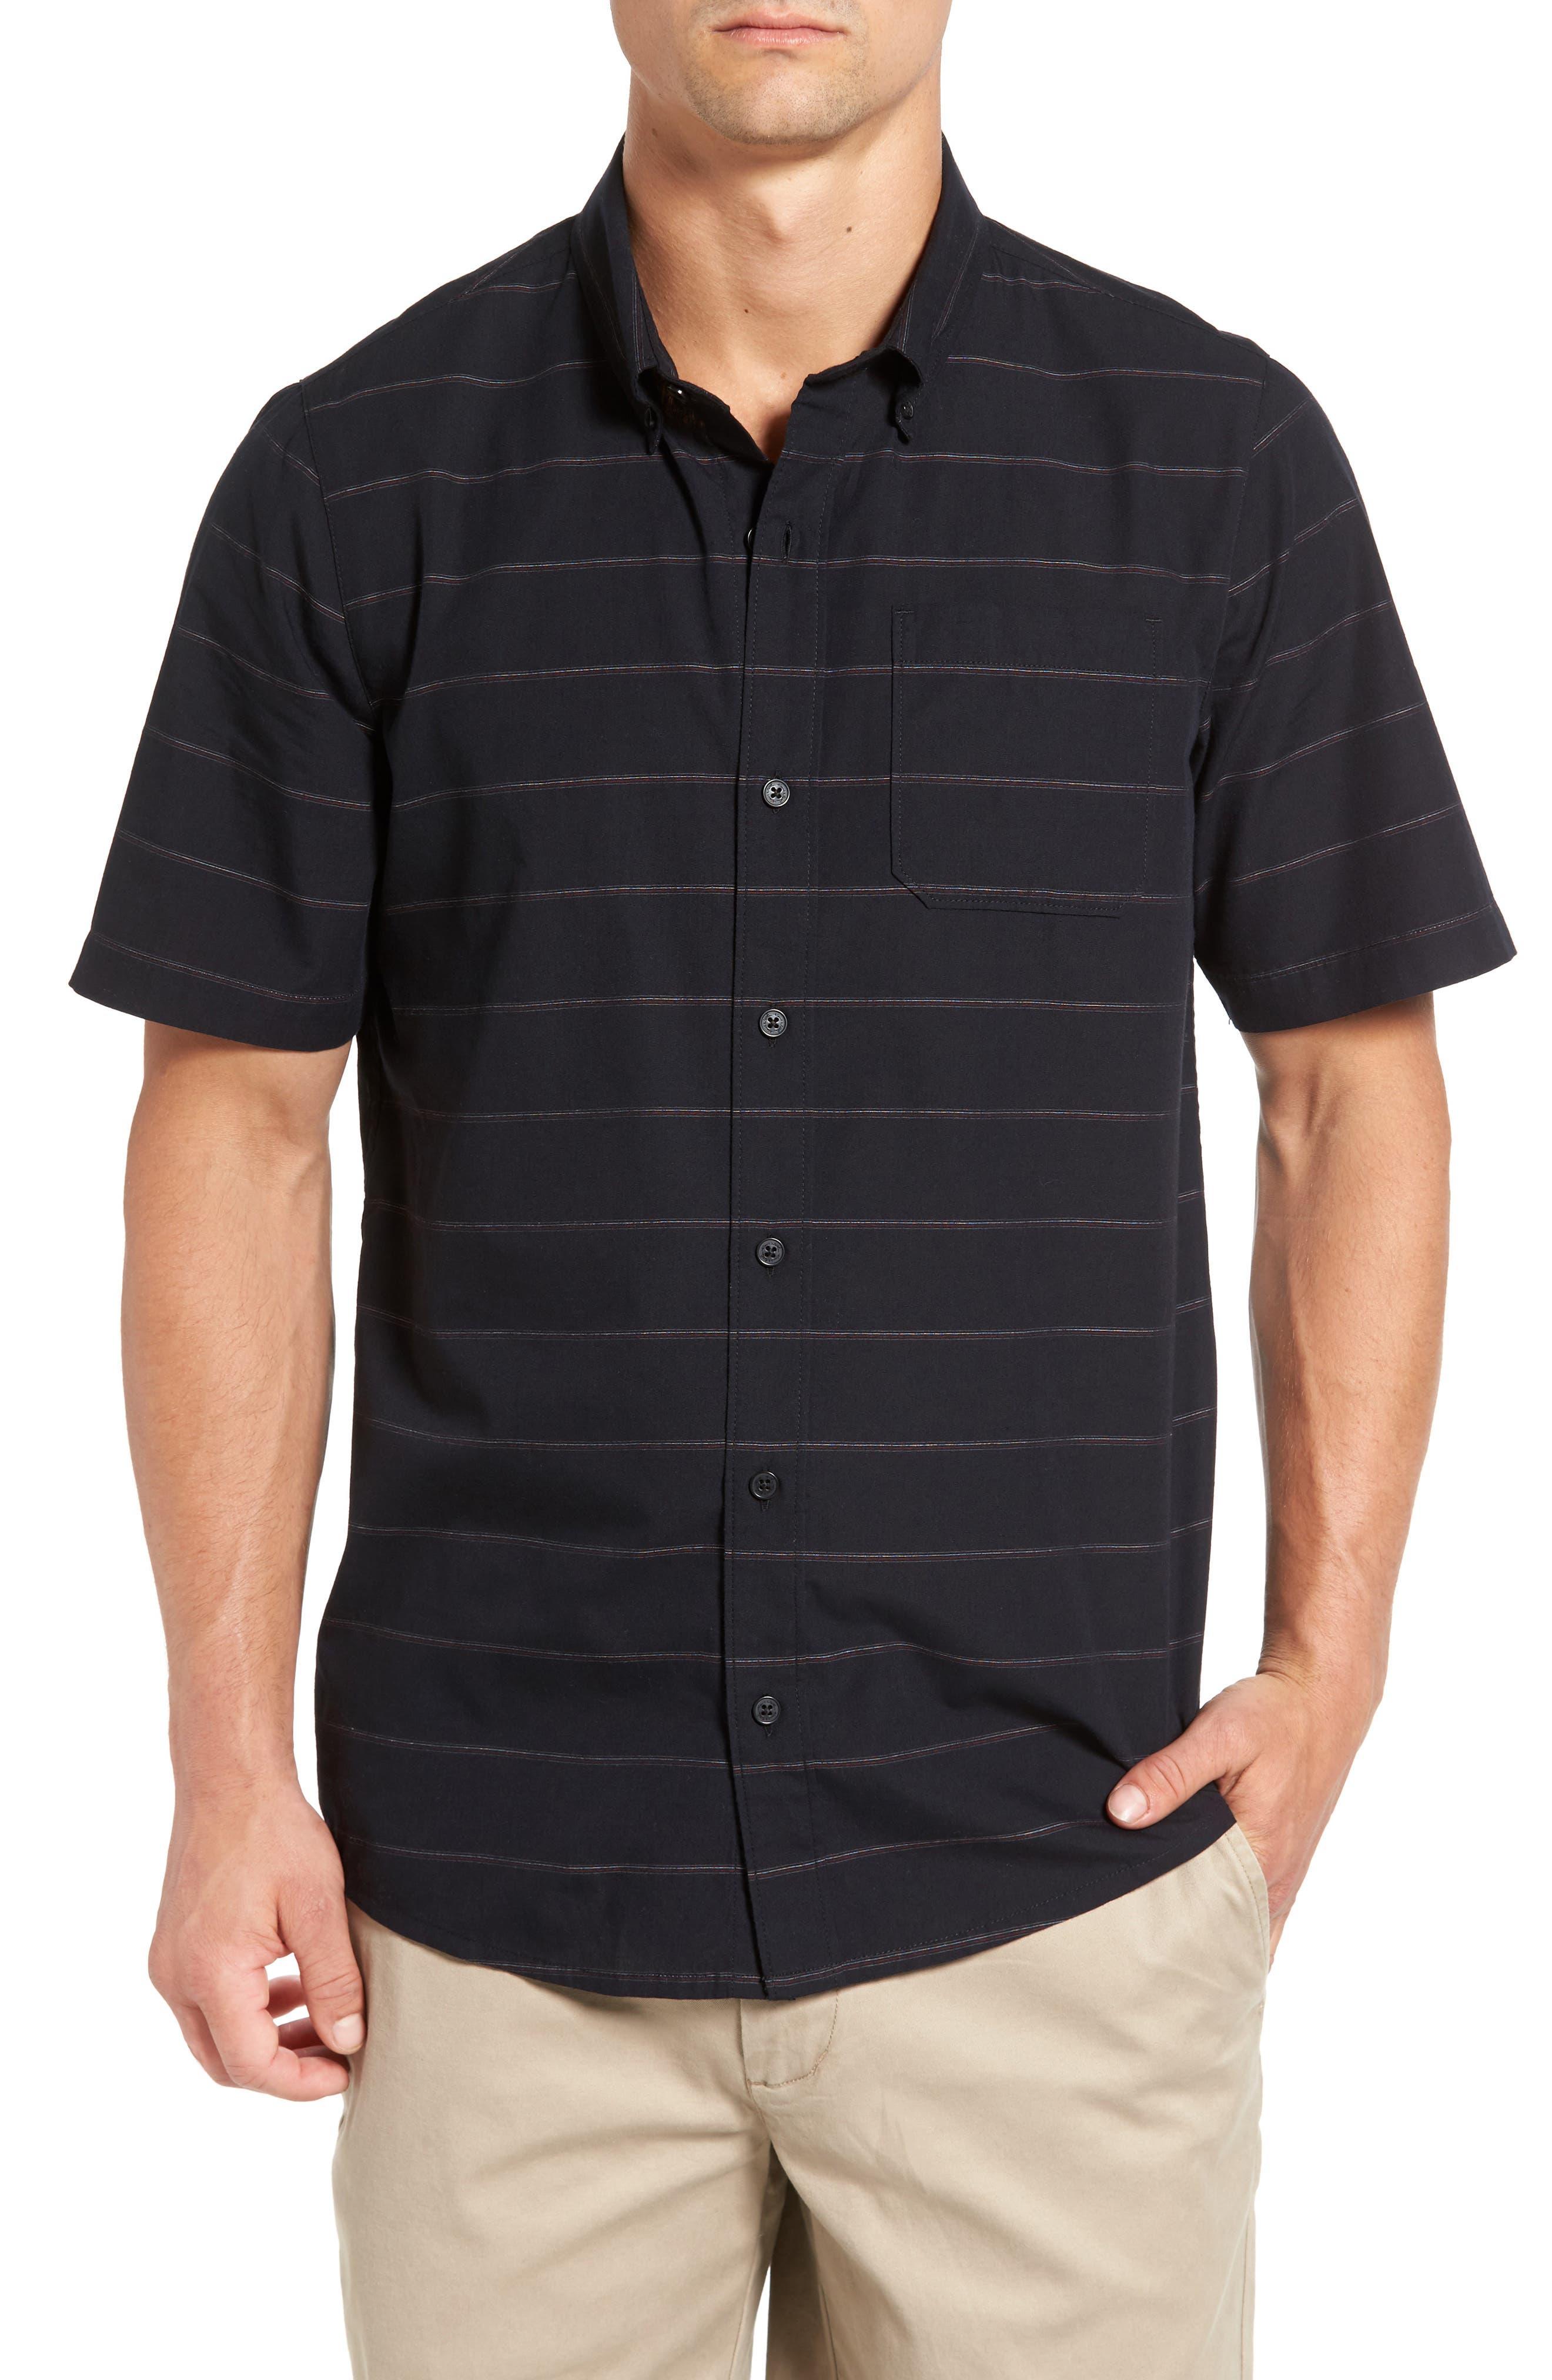 Travis Mathew Crimp Sport Shirt